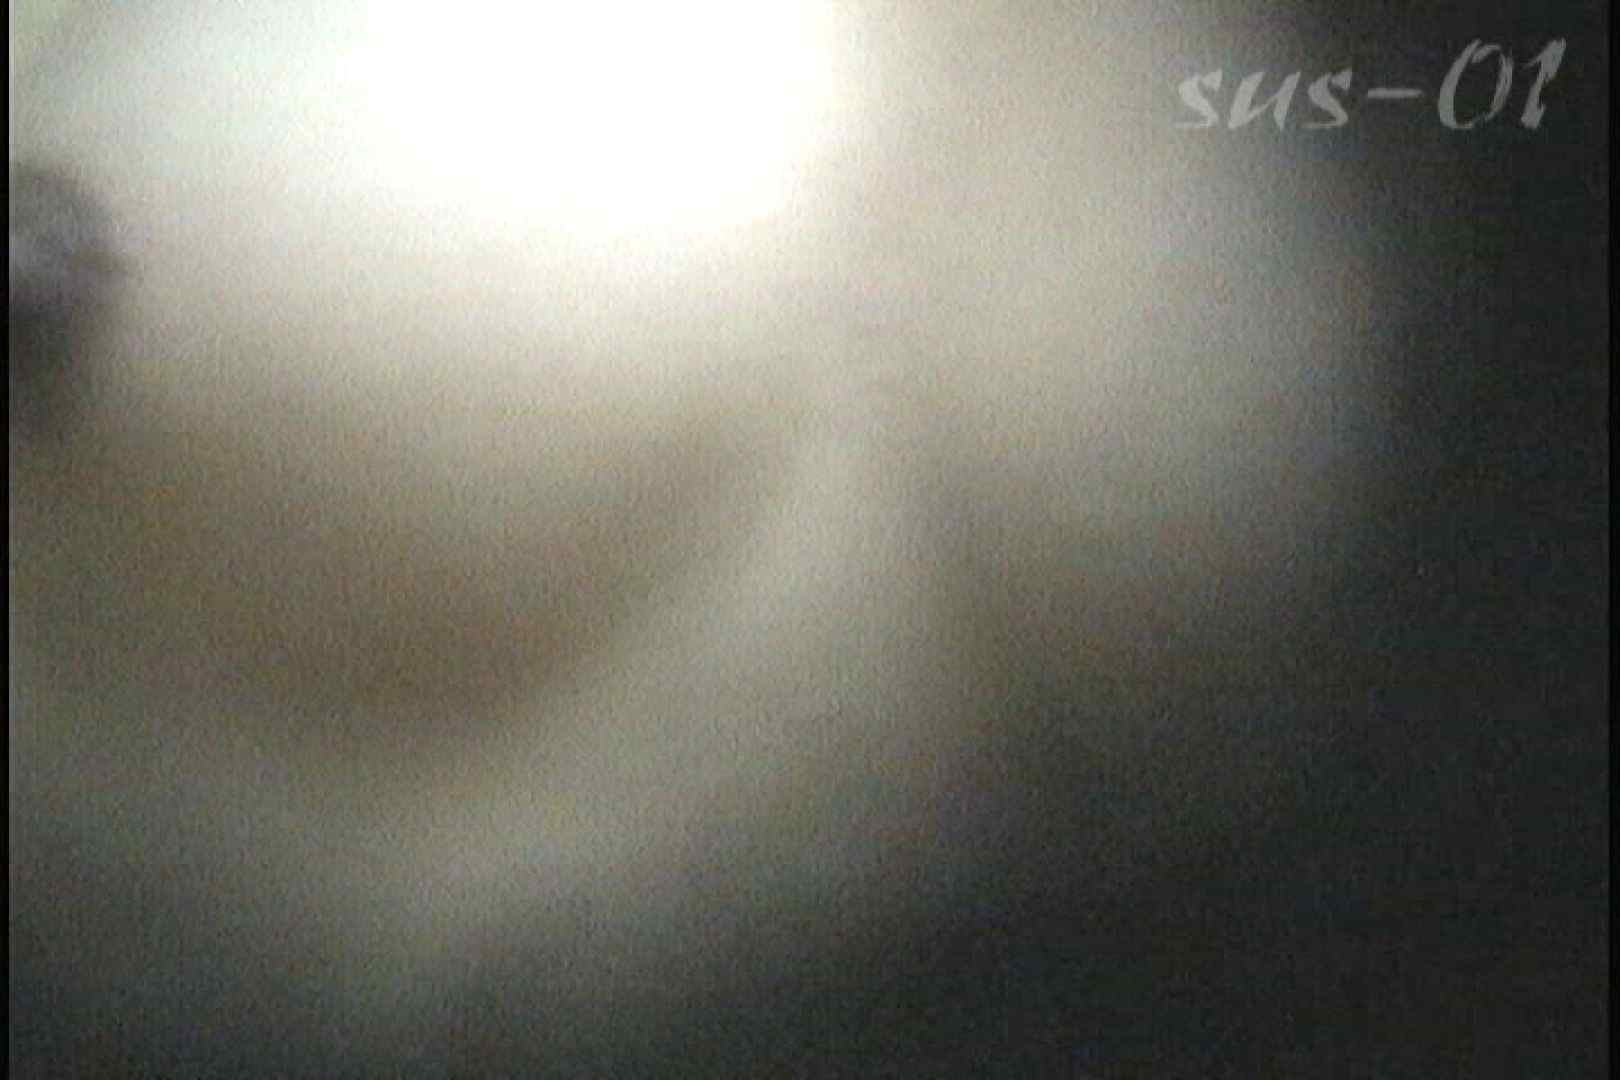 No.3 金髪ギャル 薄い陰毛の奥は一本スジが。 ギャル盗撮映像 ワレメ無修正動画無料 109PIX 94